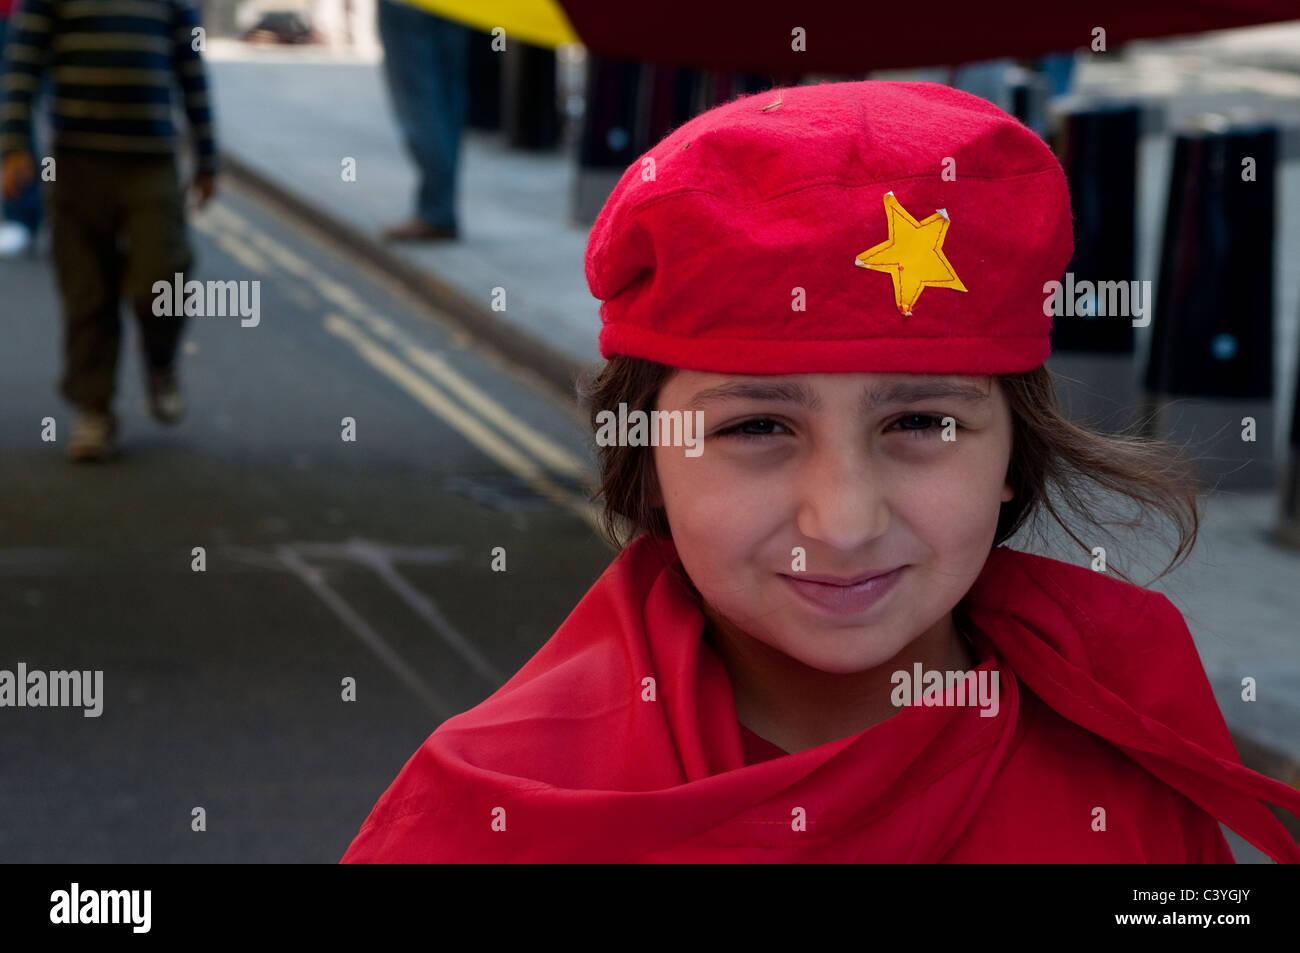 May Day Parade, Turkish child demonstrator marching down Theobalds Road, London, UK, 2011 - Stock Image